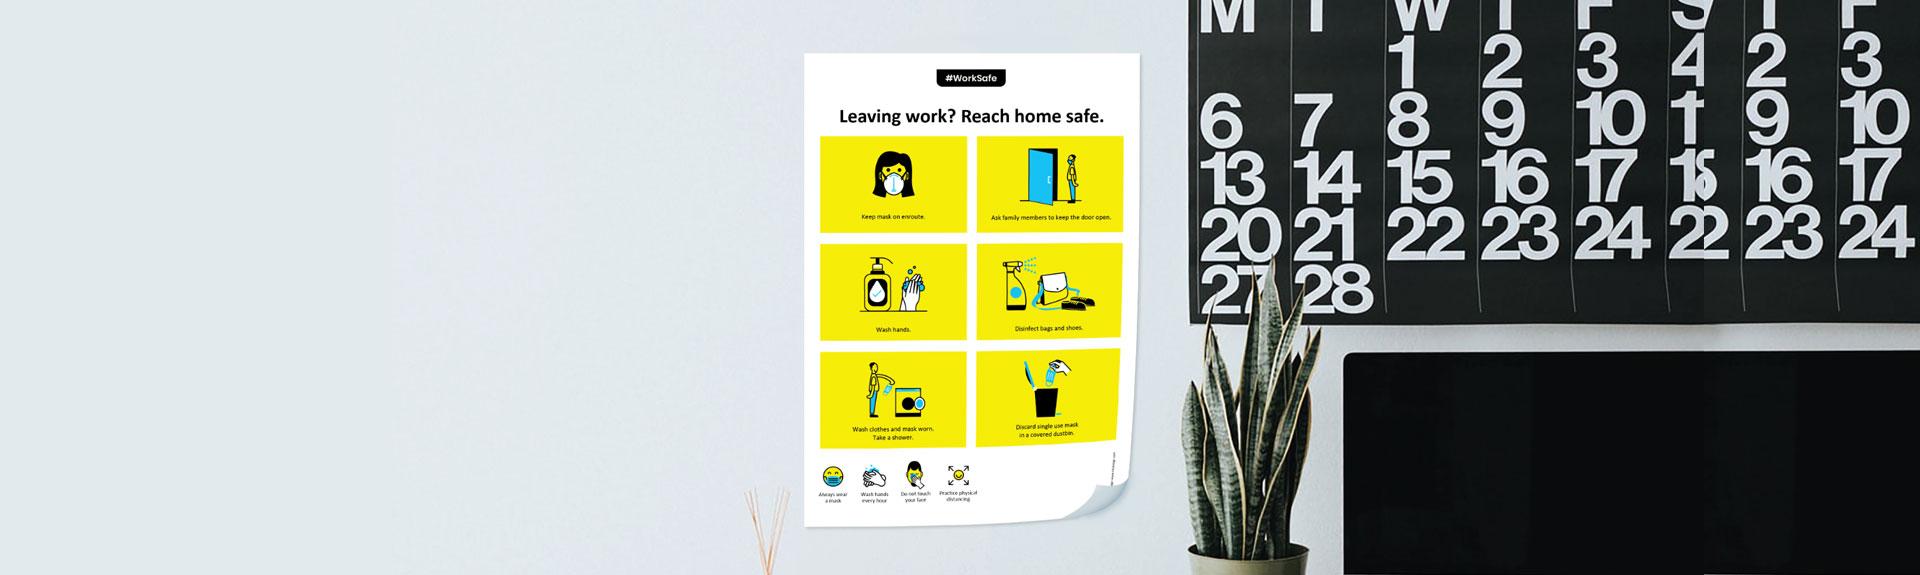 Leaving Home_web banner